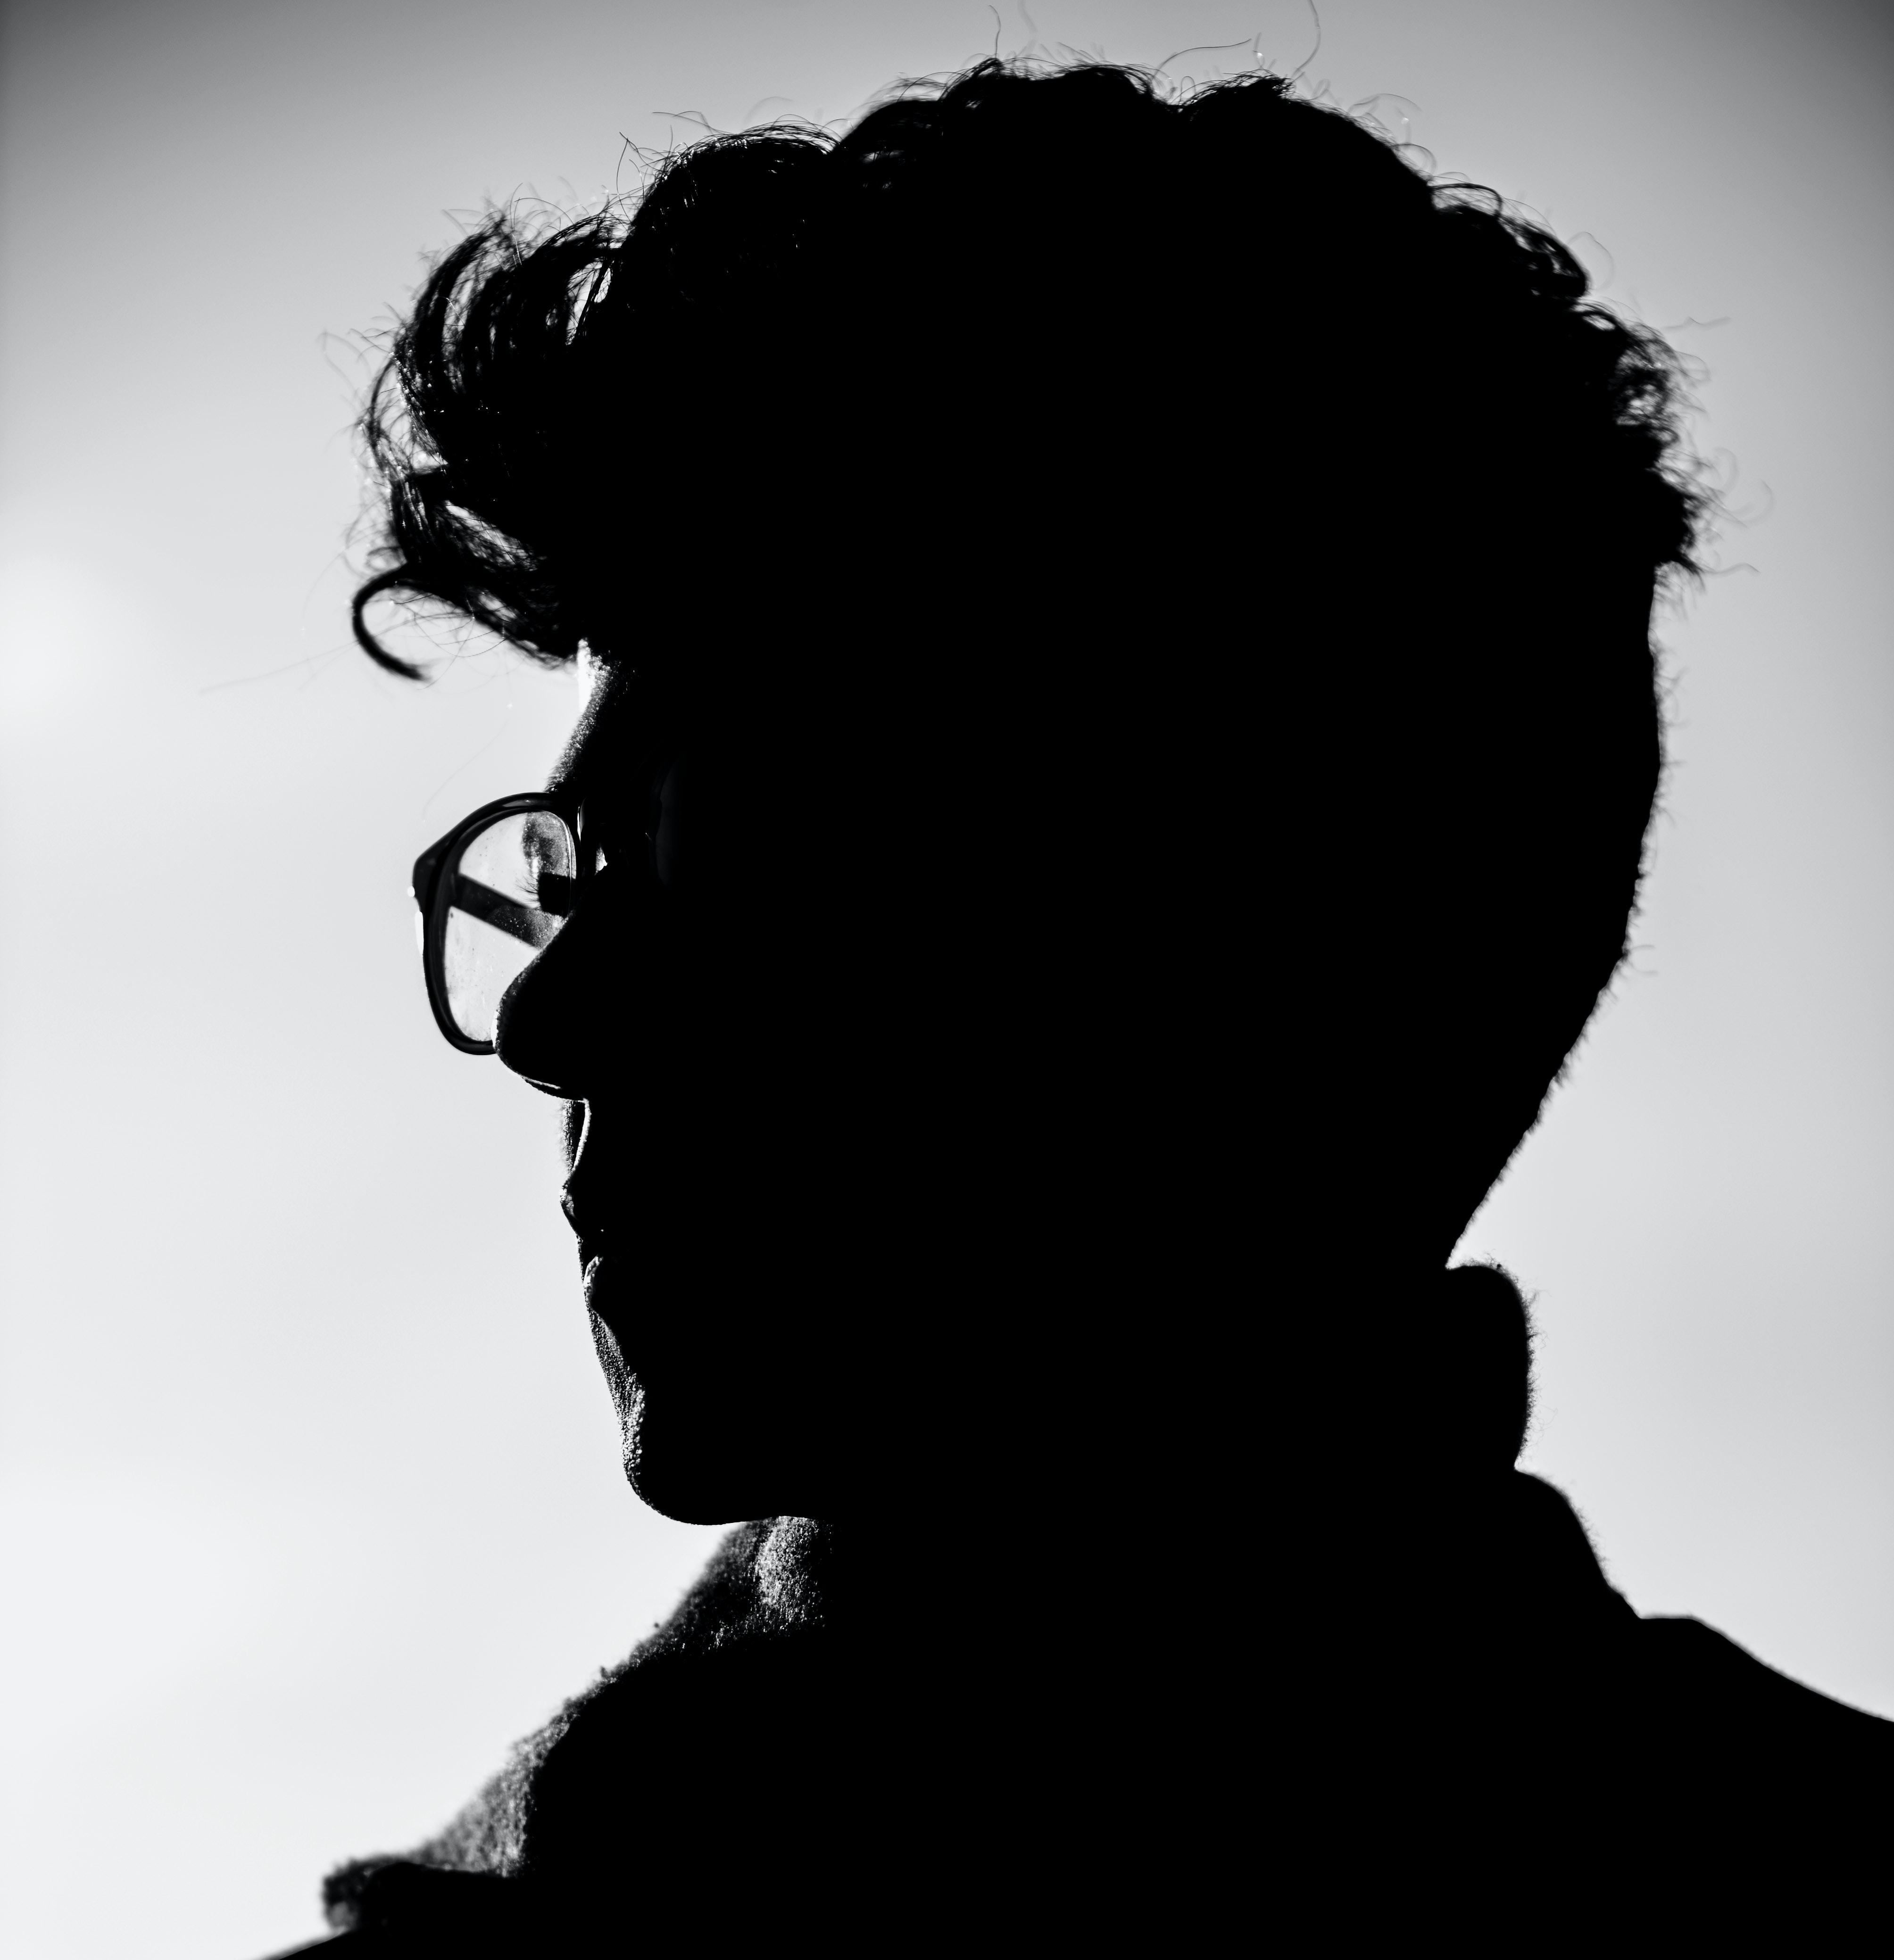 Team member silhouette